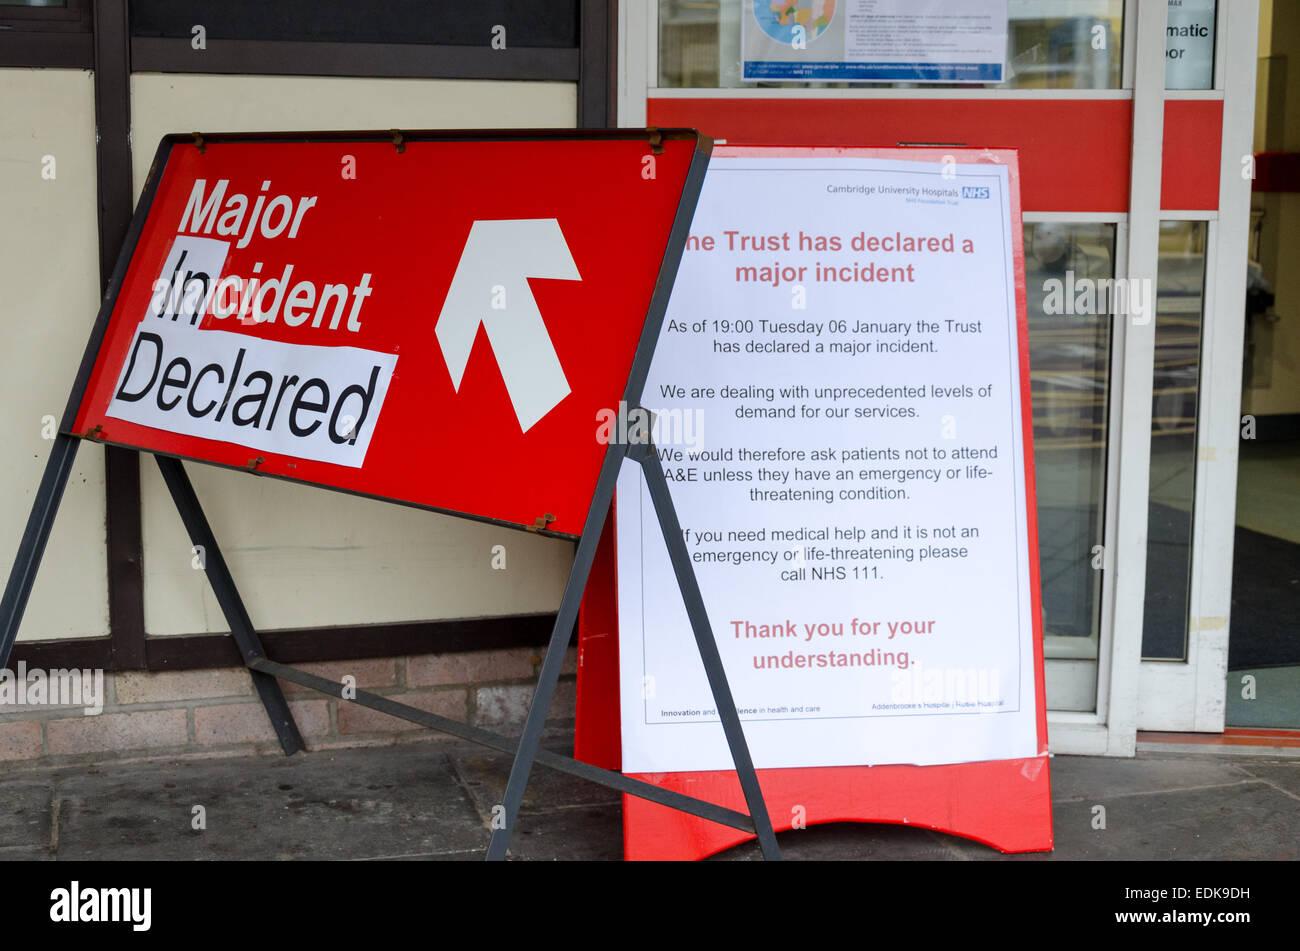 Major incident declared at Addenbrooke's Hospital, Cambridge, UK - Stock Image